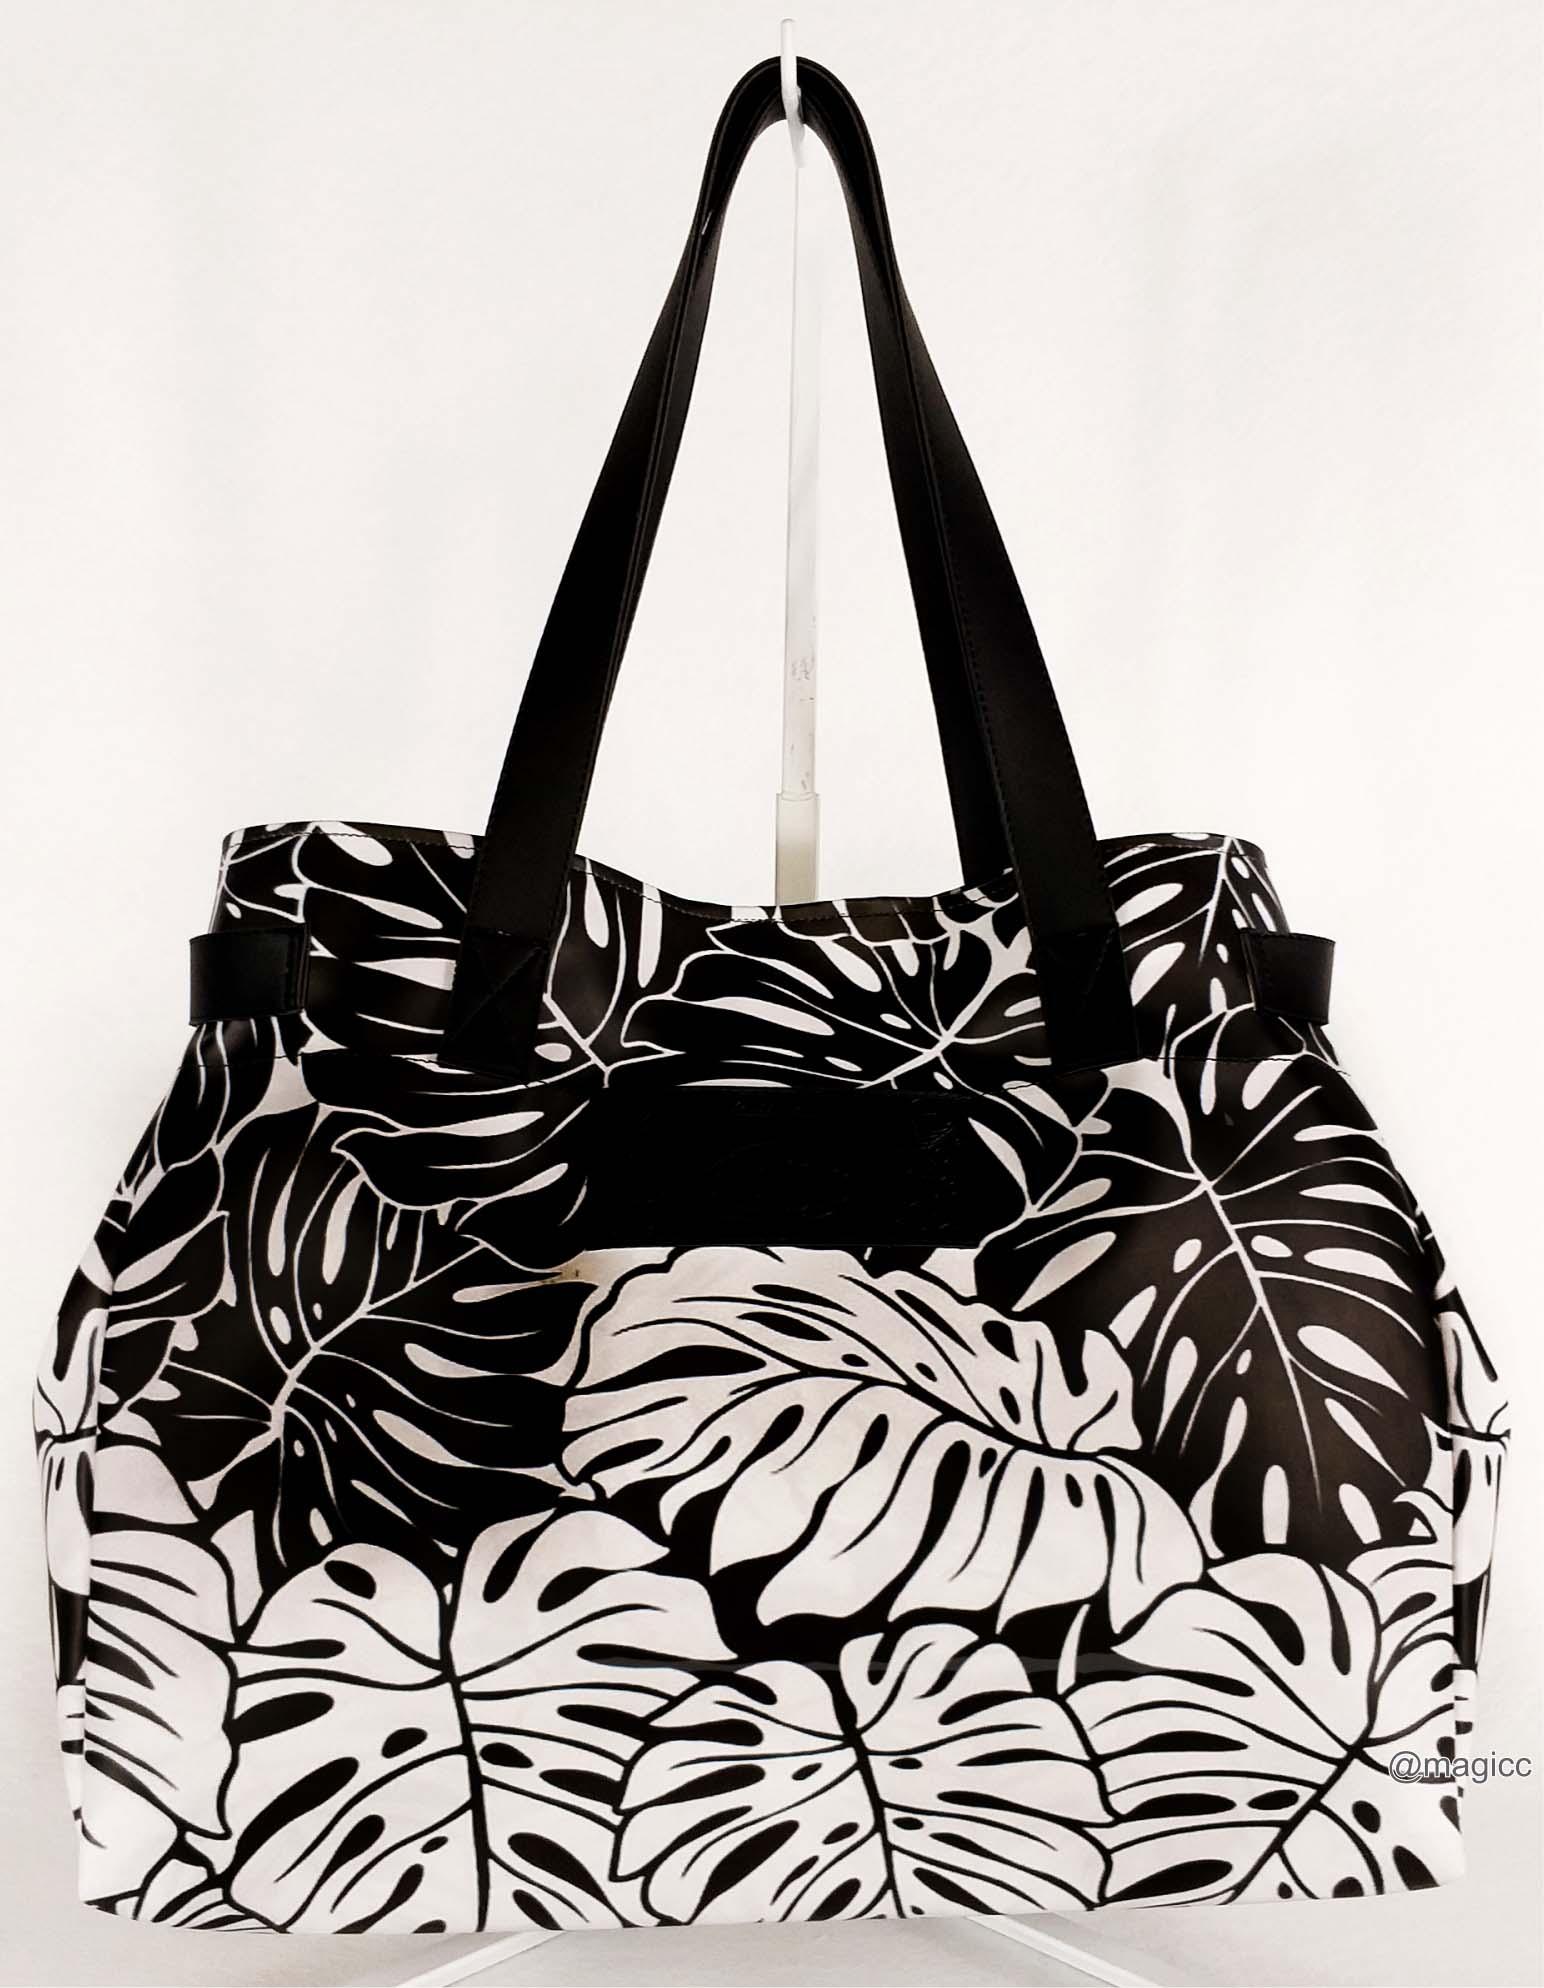 Kit Feminino Tropical Branco e Preto com Bolsa, Necessaire e Chinelo, Magicc